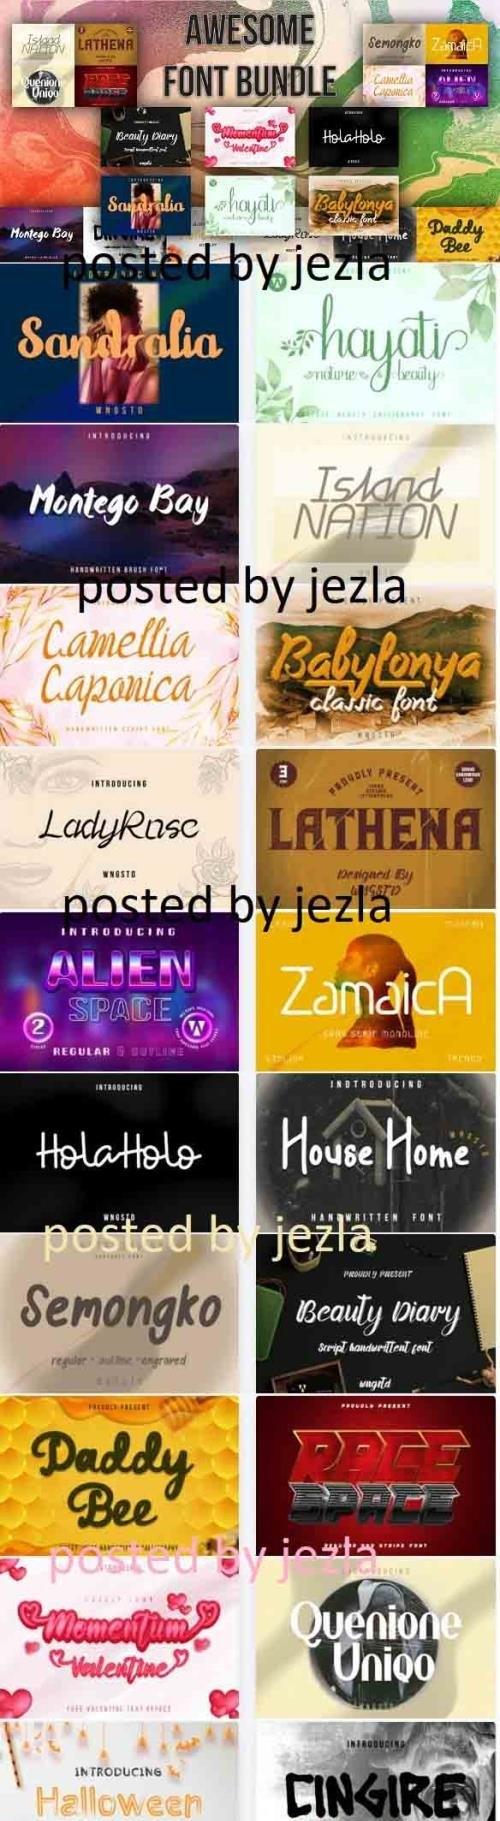 Awesome Fonts Bundle - 20 Premium Fonts